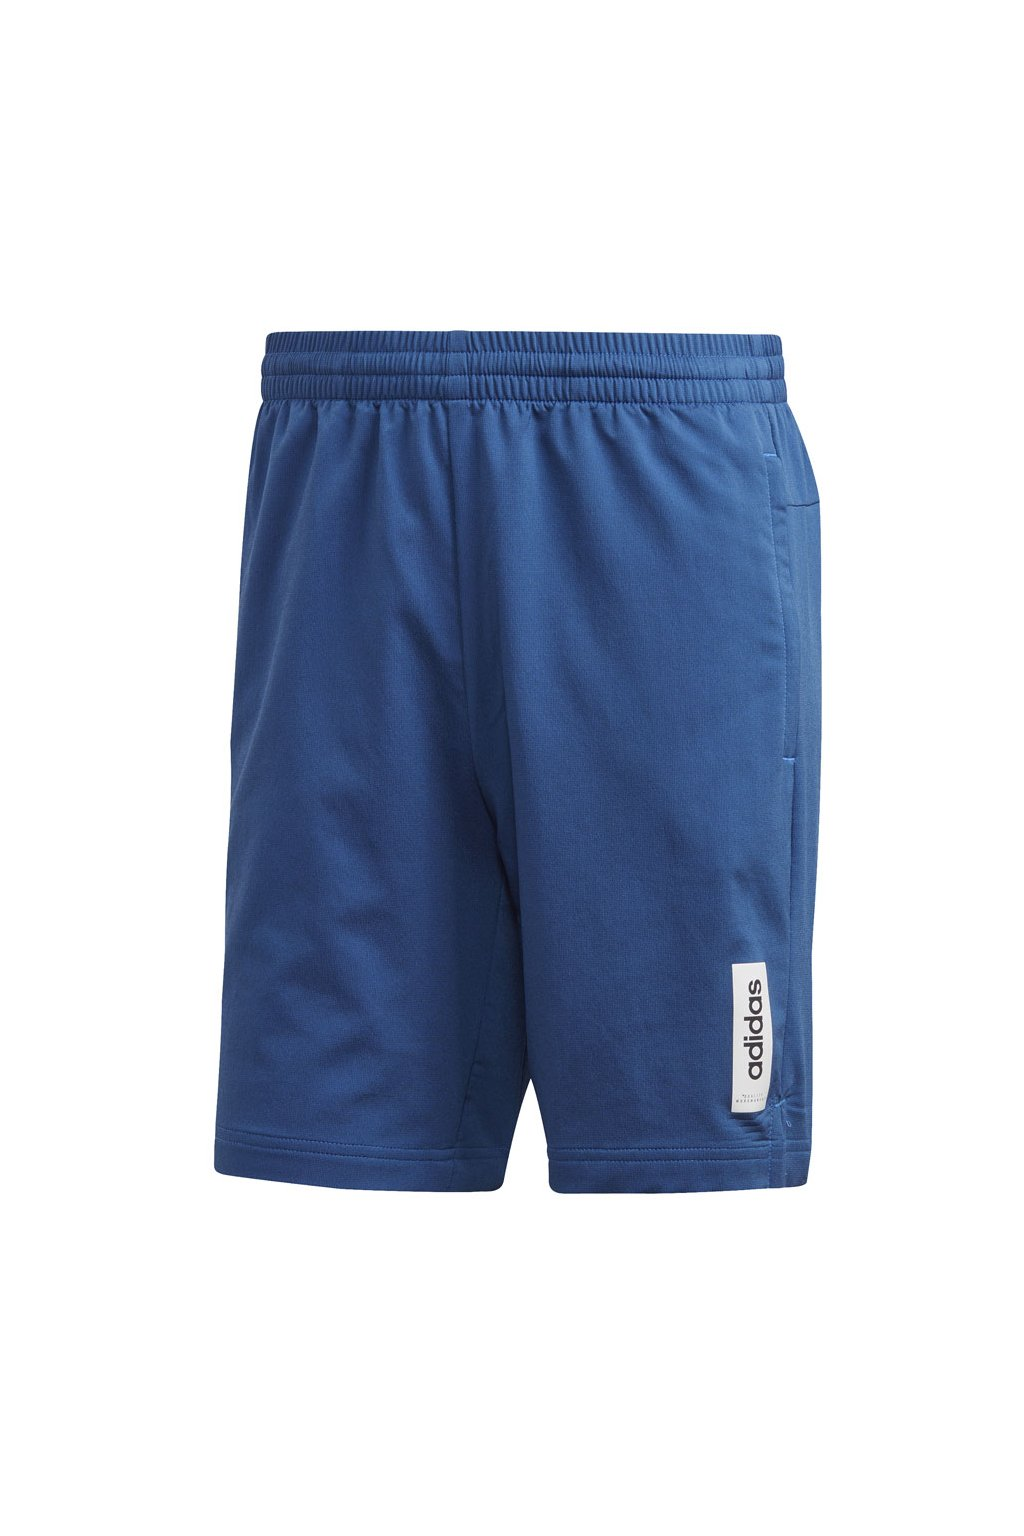 Pánske kraťasy Adidas Brilliant Basics Short modré FL9011